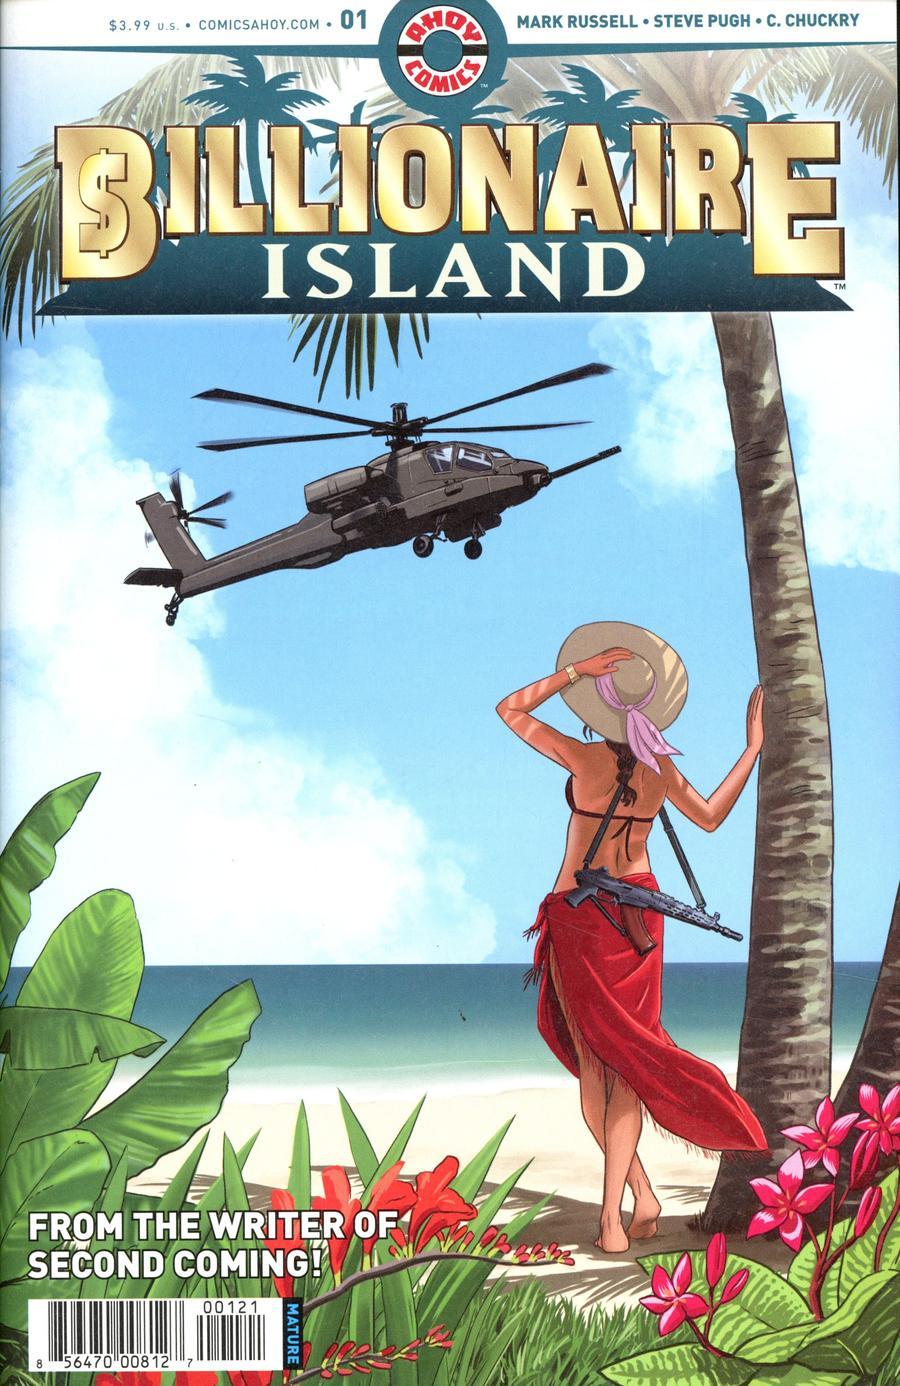 Billionaire Island #1 Cover B Variant Pia Guerra Cover